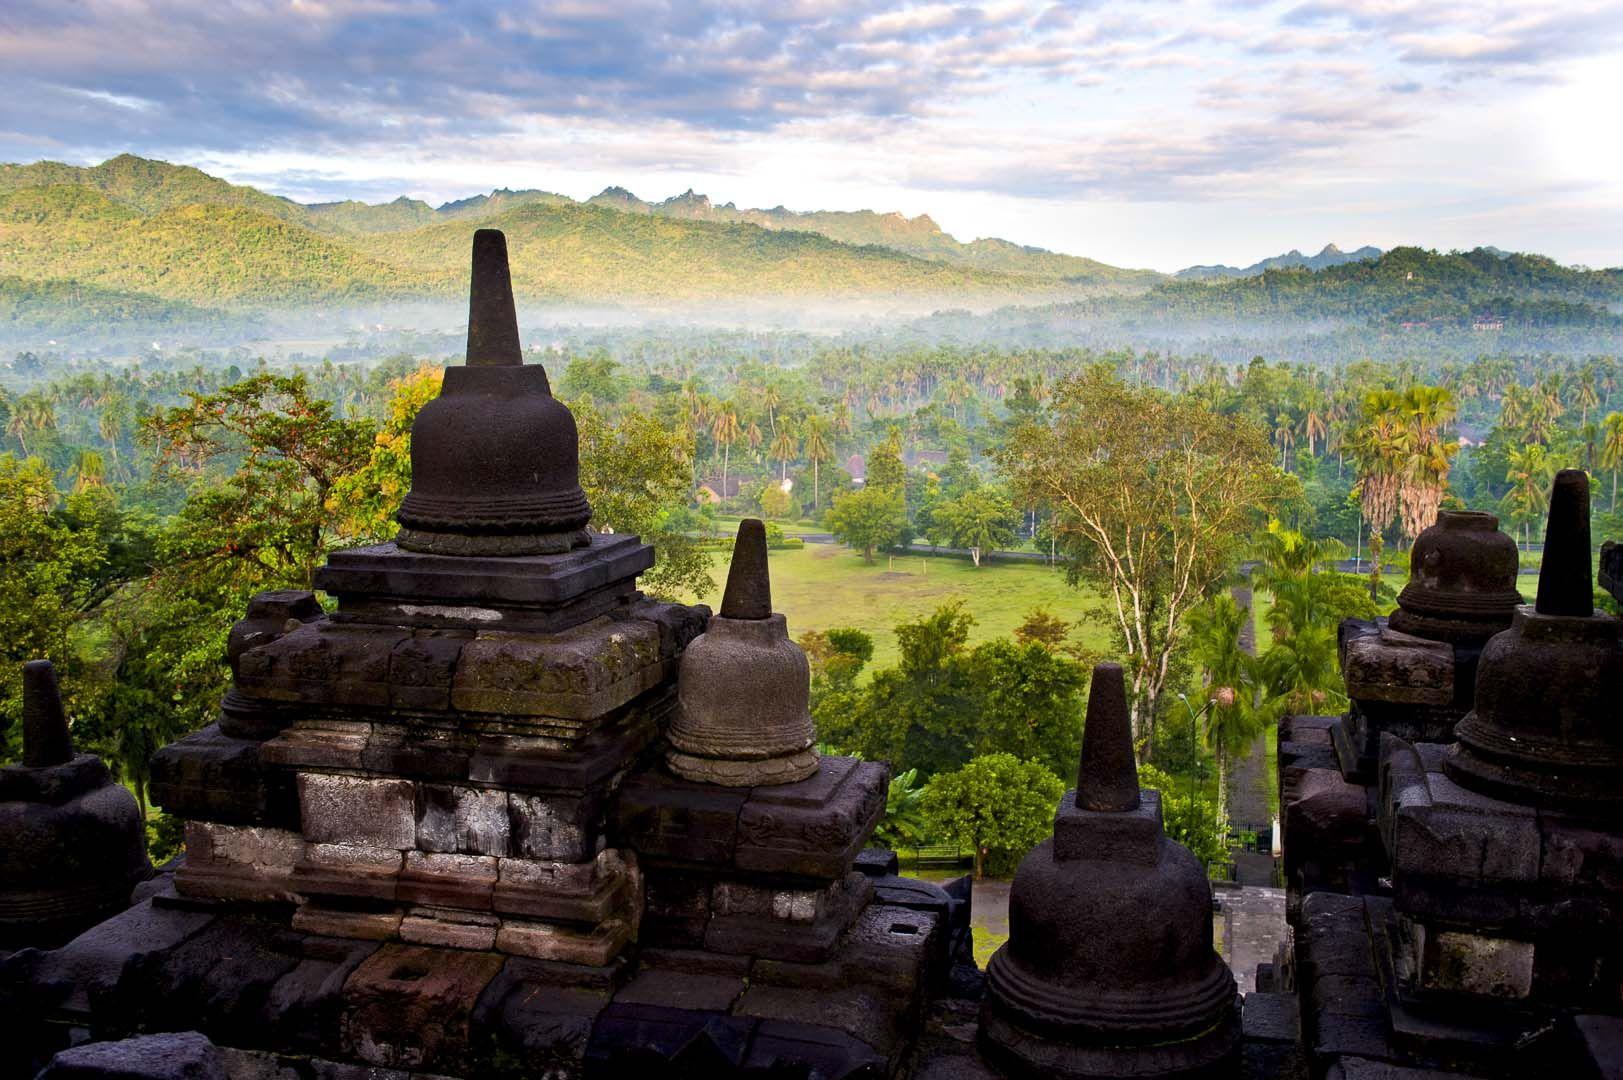 indonesia-travel-landscape-photography-sunrise-at-borobudur-temple-yogyakarta-java-indonesia-travel-landscape-photography-by-travel-and-landscape-photographer-matthew-williams-ellis.jpg (1623×1080)